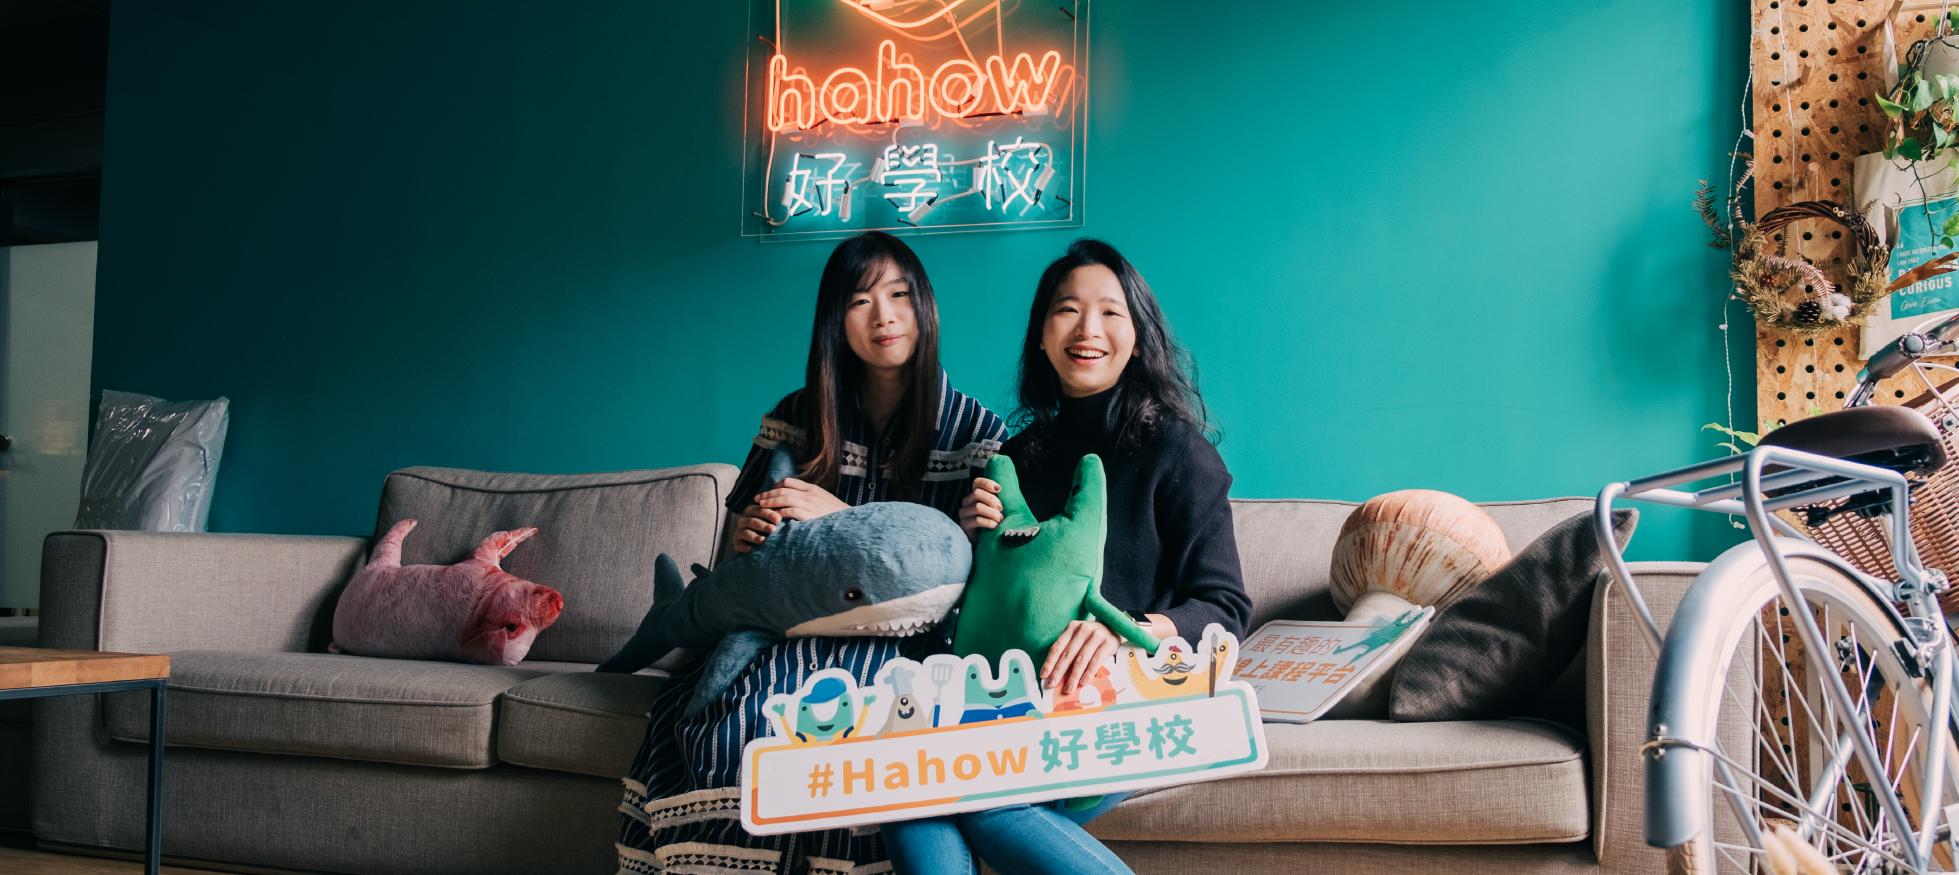 Hahow 課程業務開發 Content Acquisition